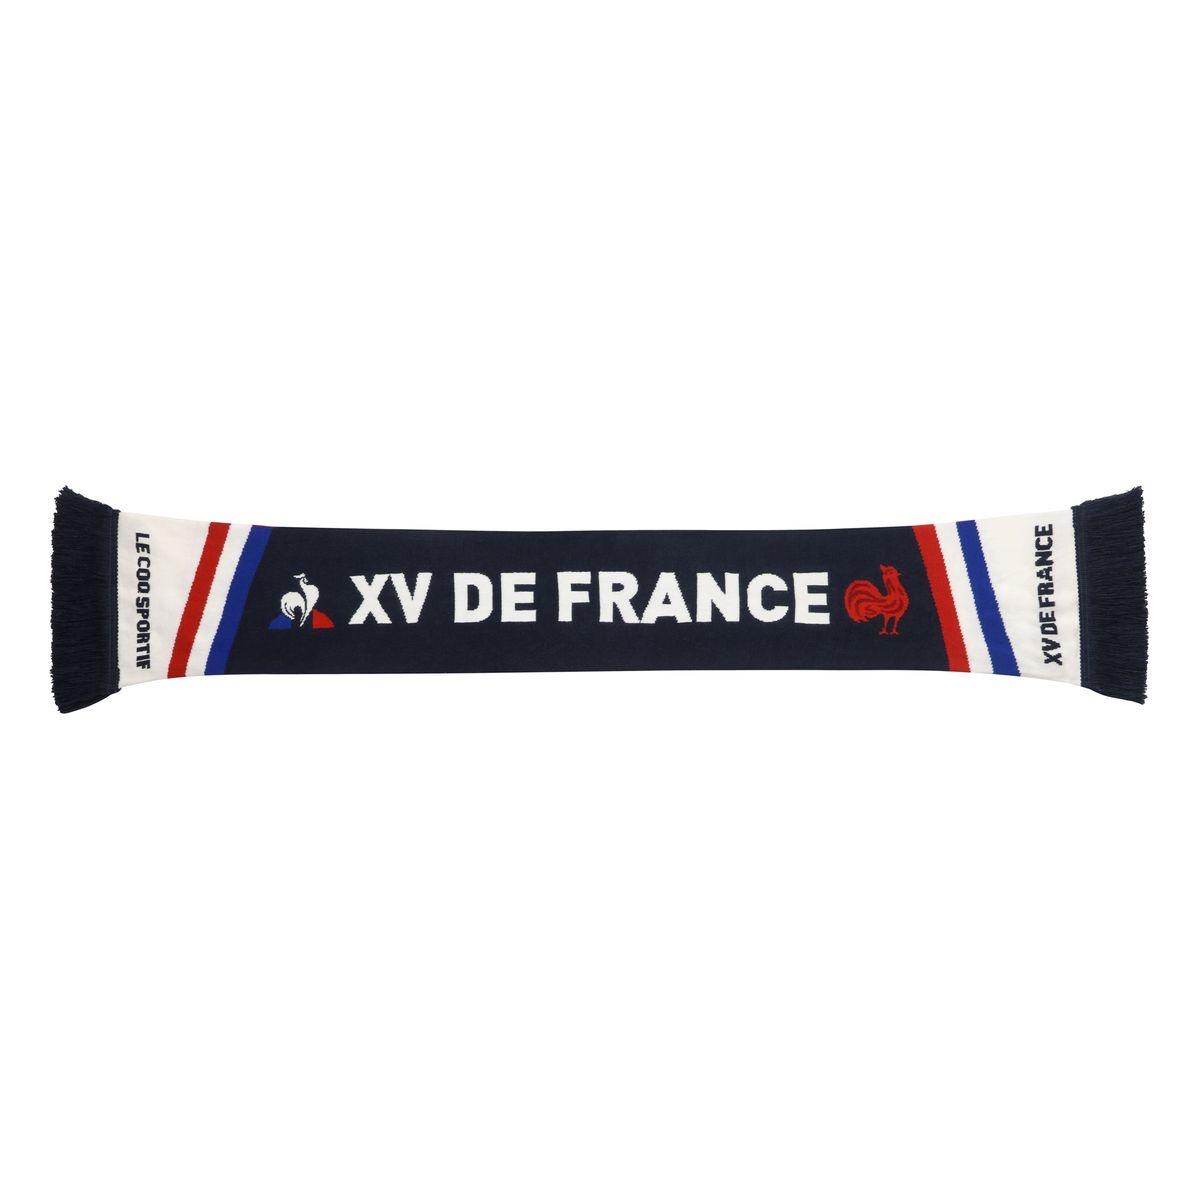 Echarpe XV de France